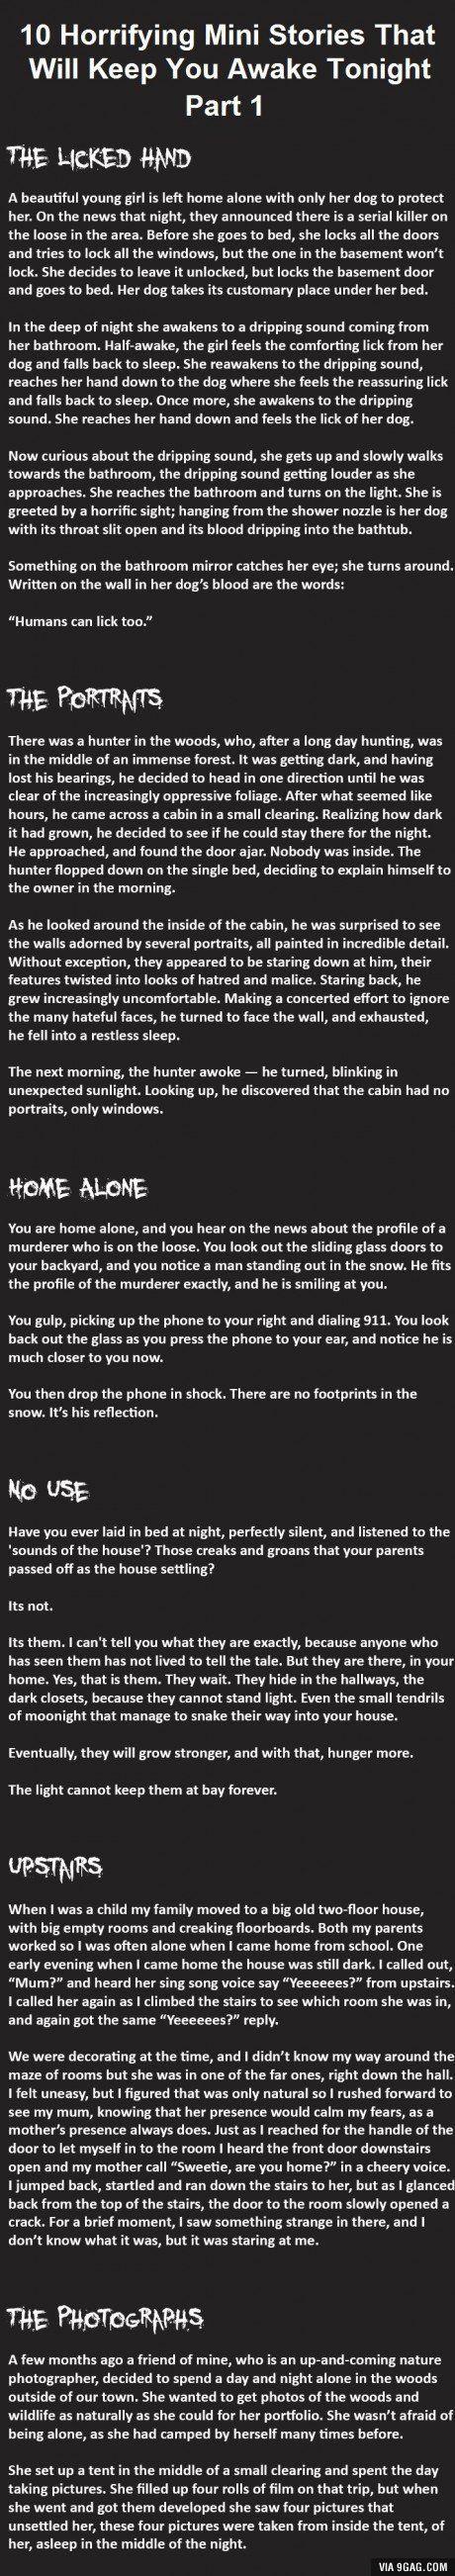 Short horror stories - Sleep tight